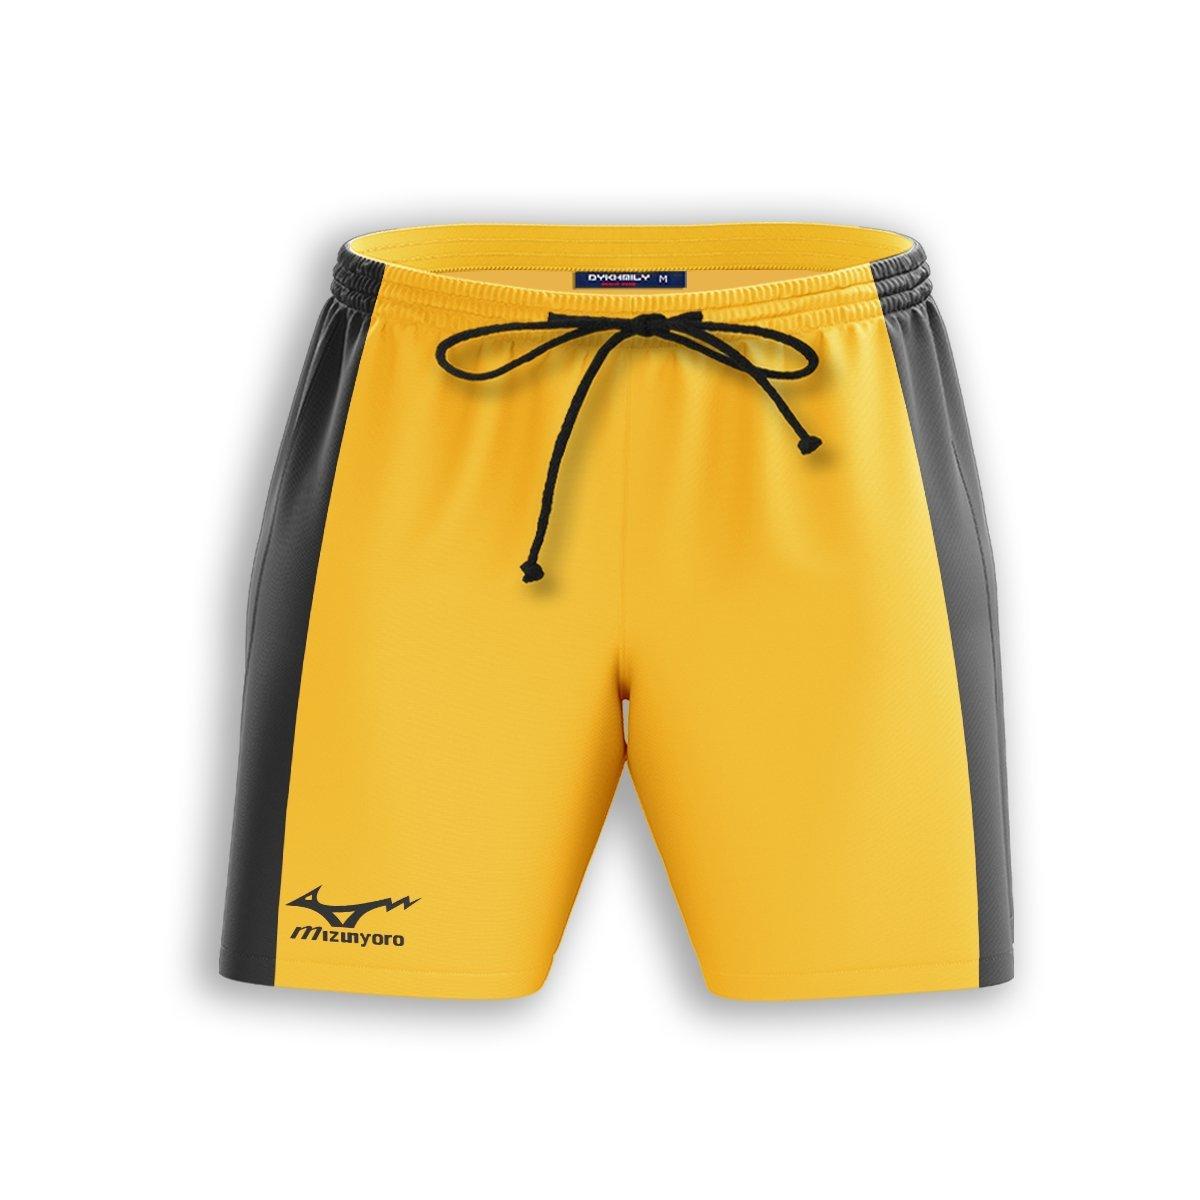 Johzenji Libero Beach Shorts FDM3107 S Official Anime Swimsuit Merch